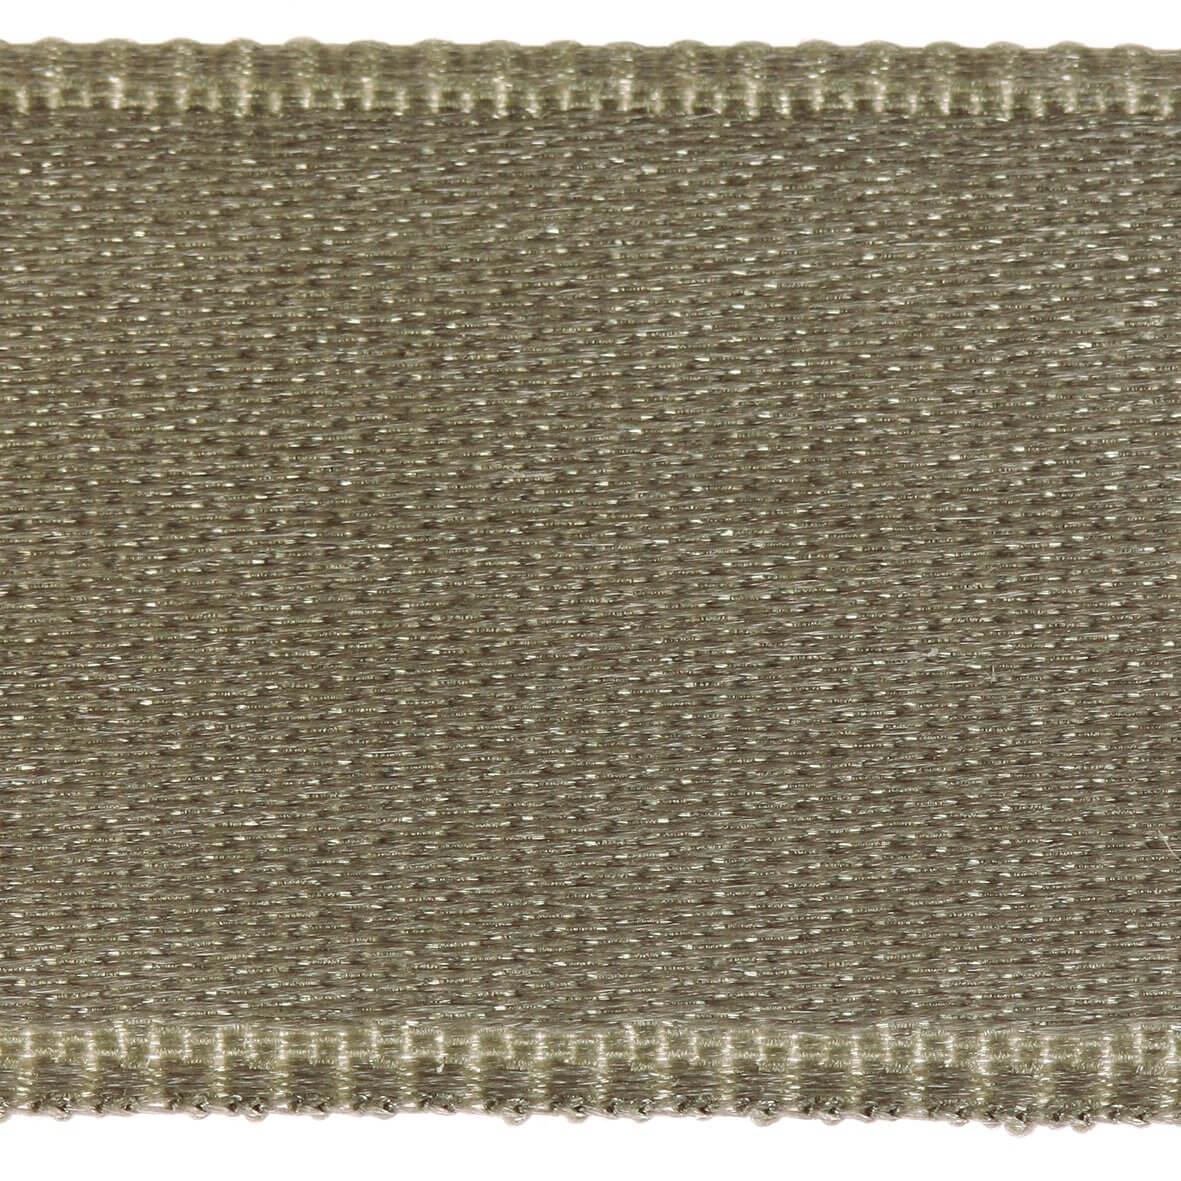 Deep Lichen Col. 521 - 25mm Satab Satin Ribbon